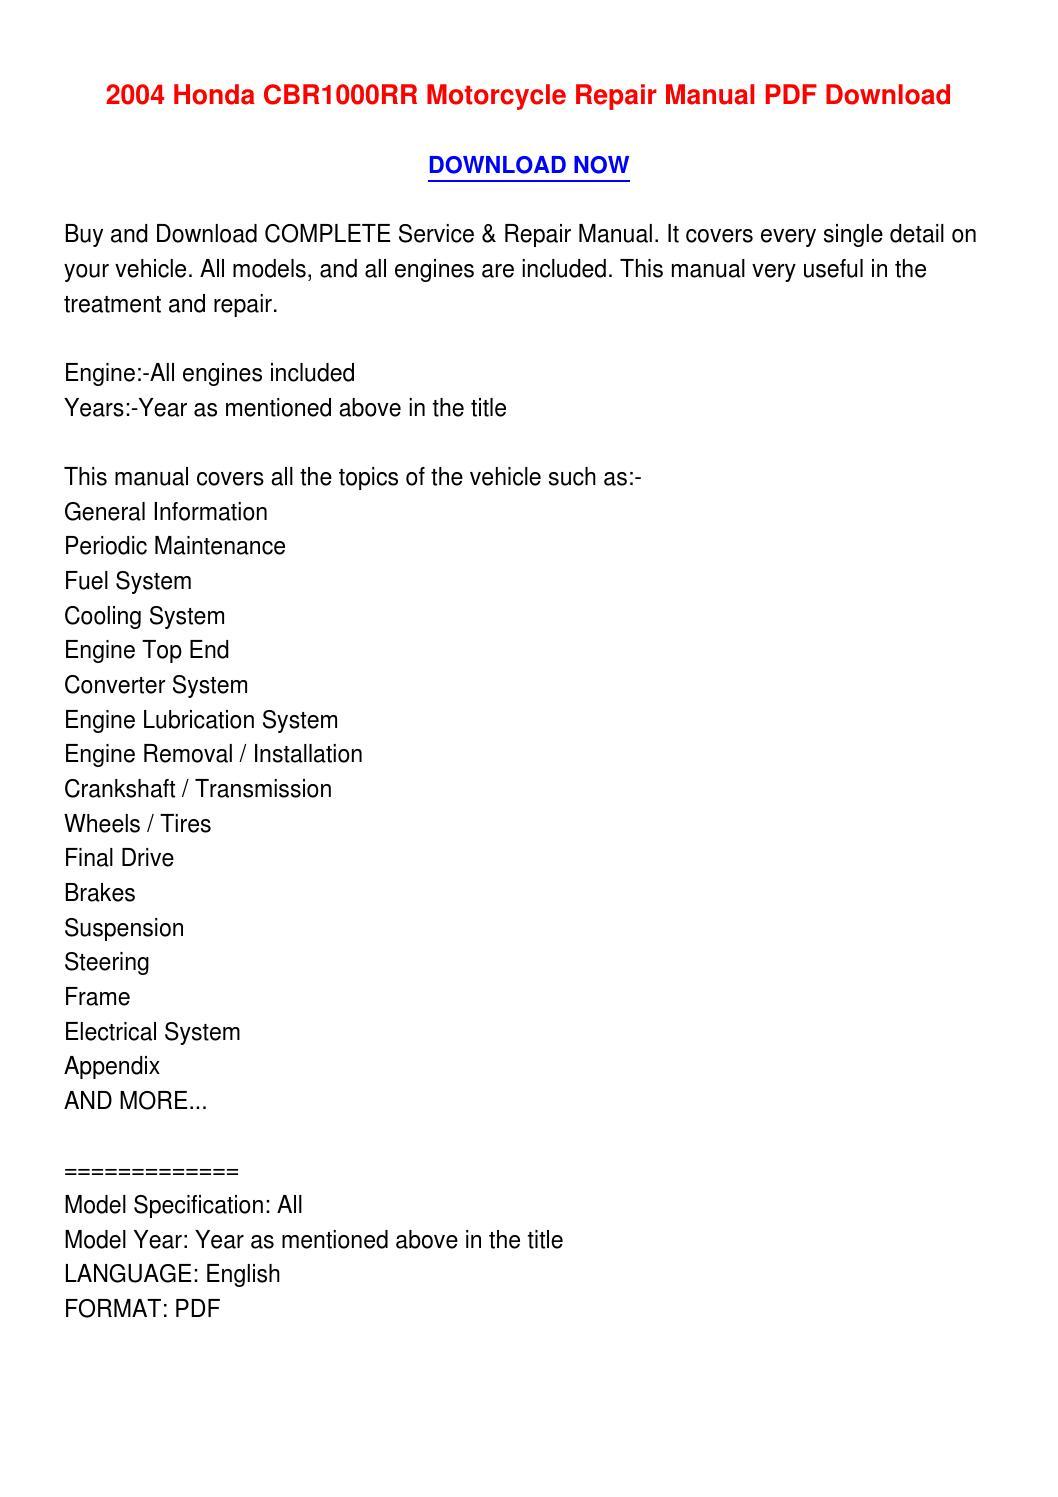 2004 honda cbr1000rr motorcycle repair manual pdf download. Black Bedroom Furniture Sets. Home Design Ideas